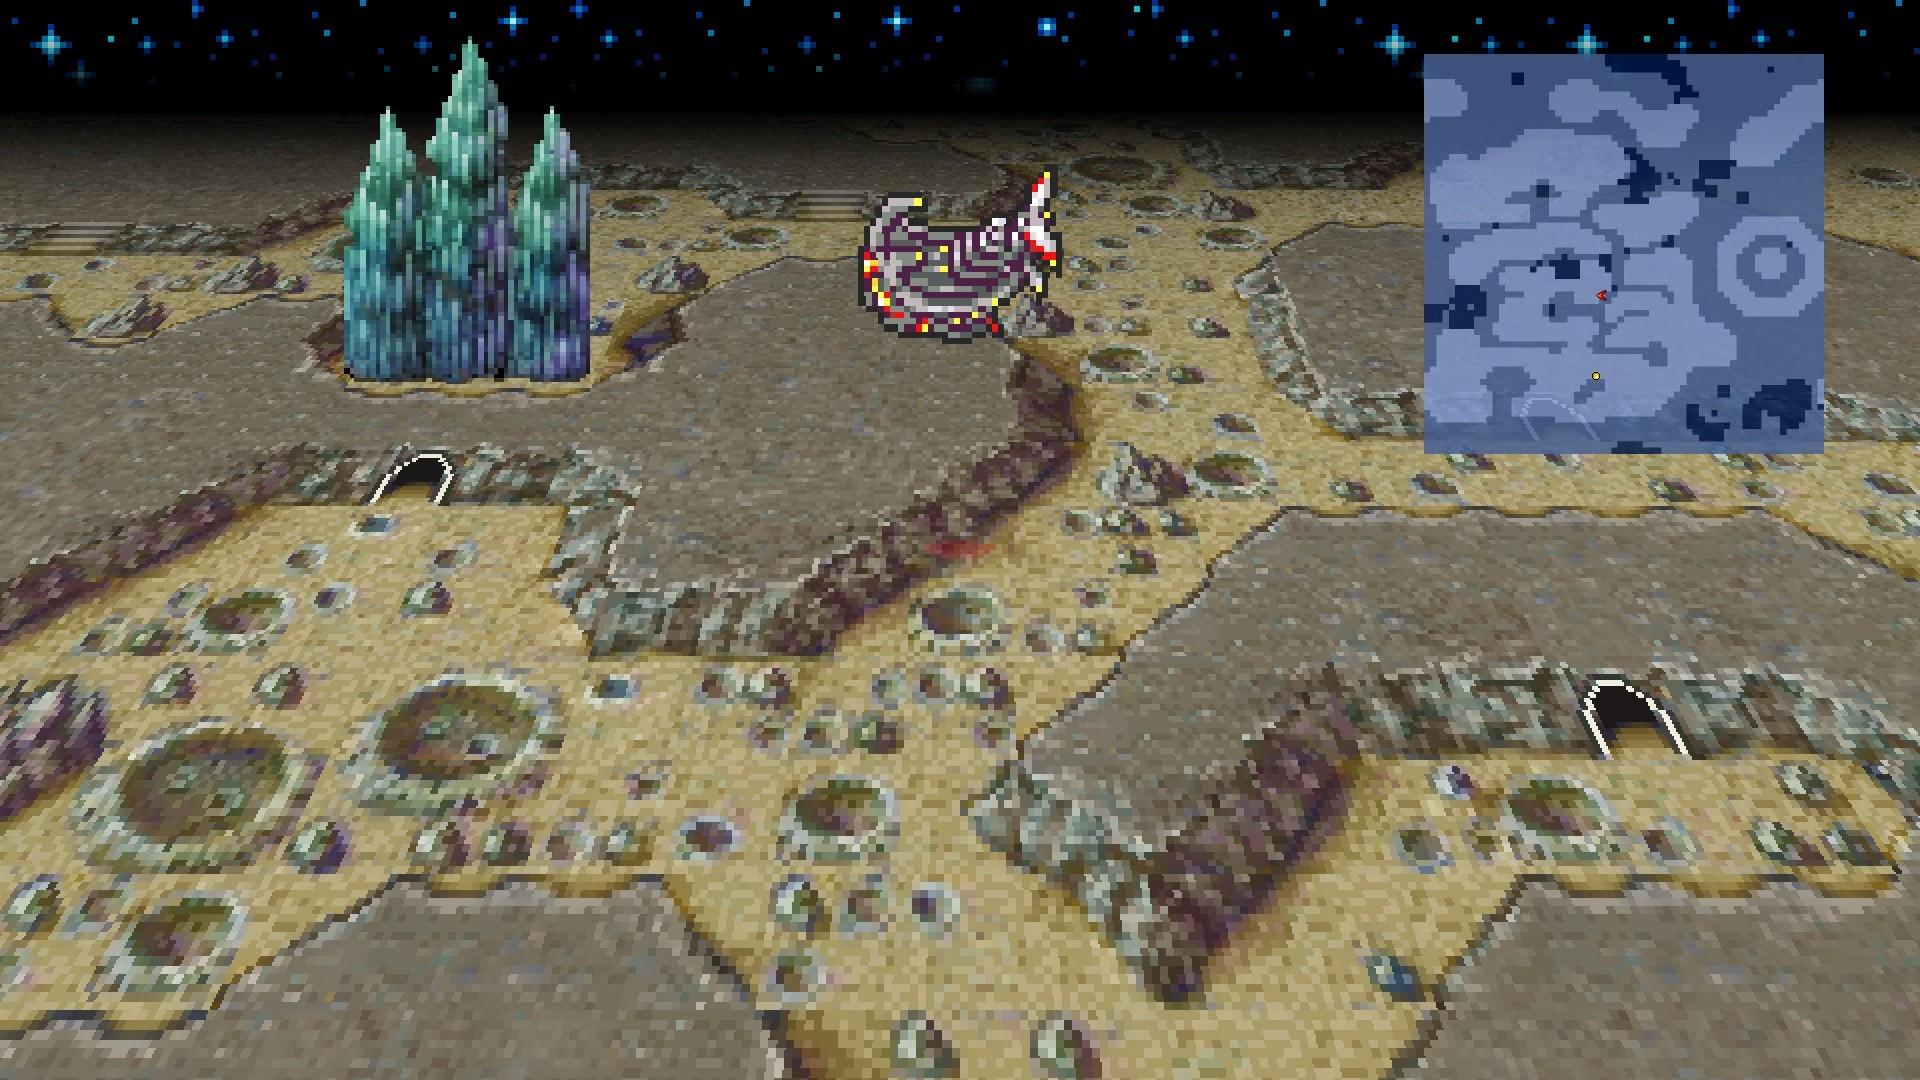 Final Fantasy IV Pixel Remaster 2582021 3